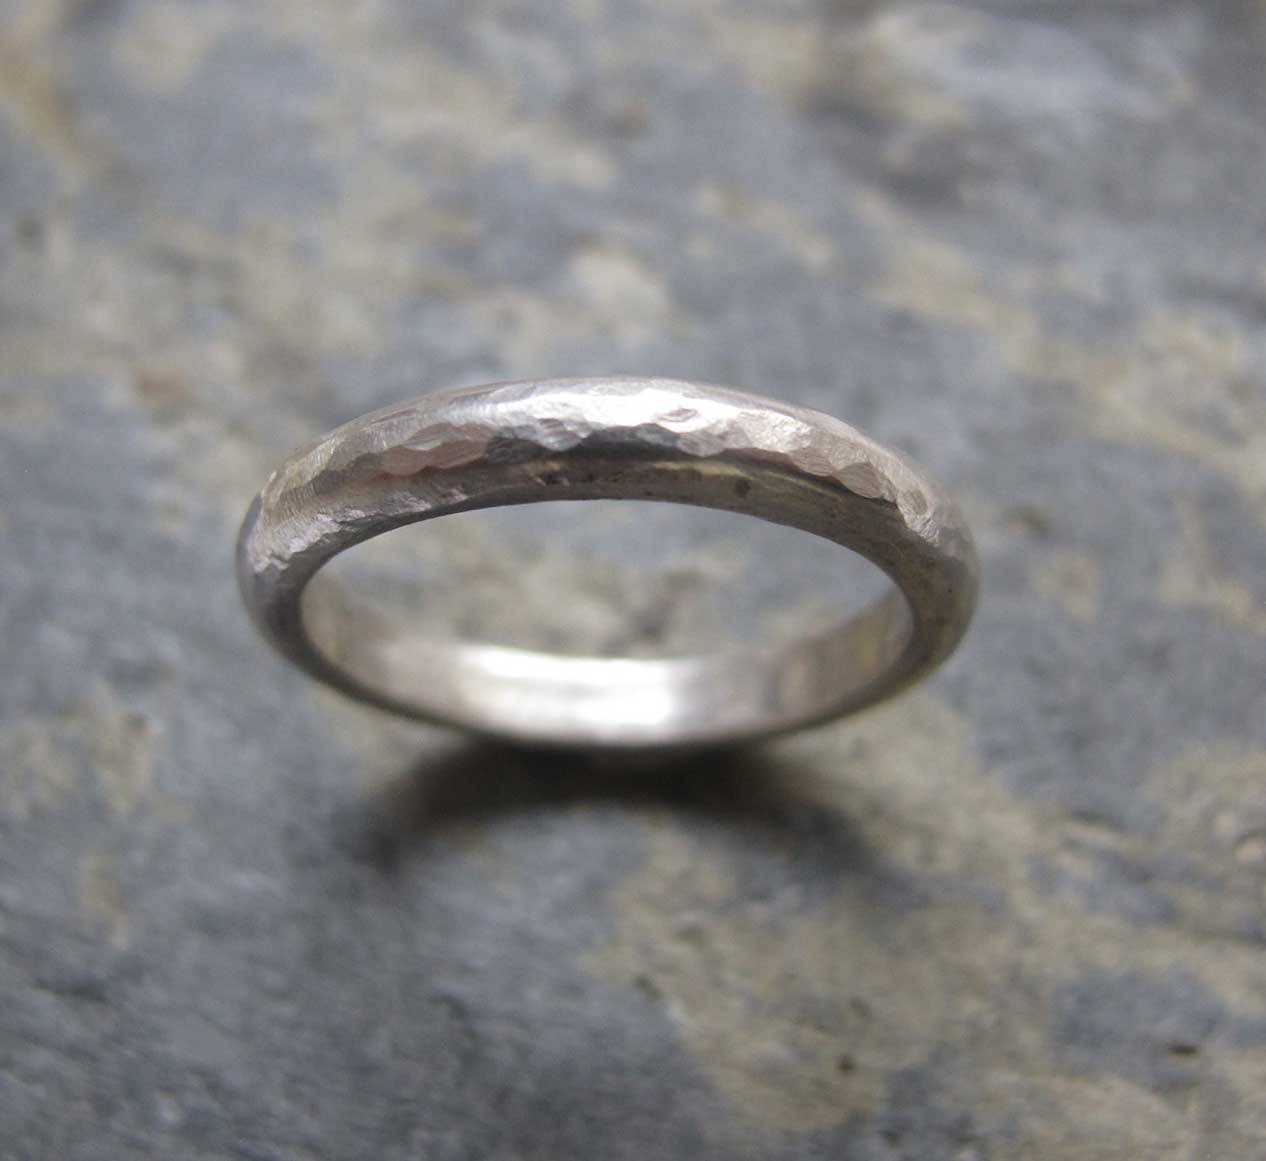 Men's Handmade Wedding Band Rings – London | London's Artist Quarter Within Mens Handmade Wedding Bands (View 14 of 15)